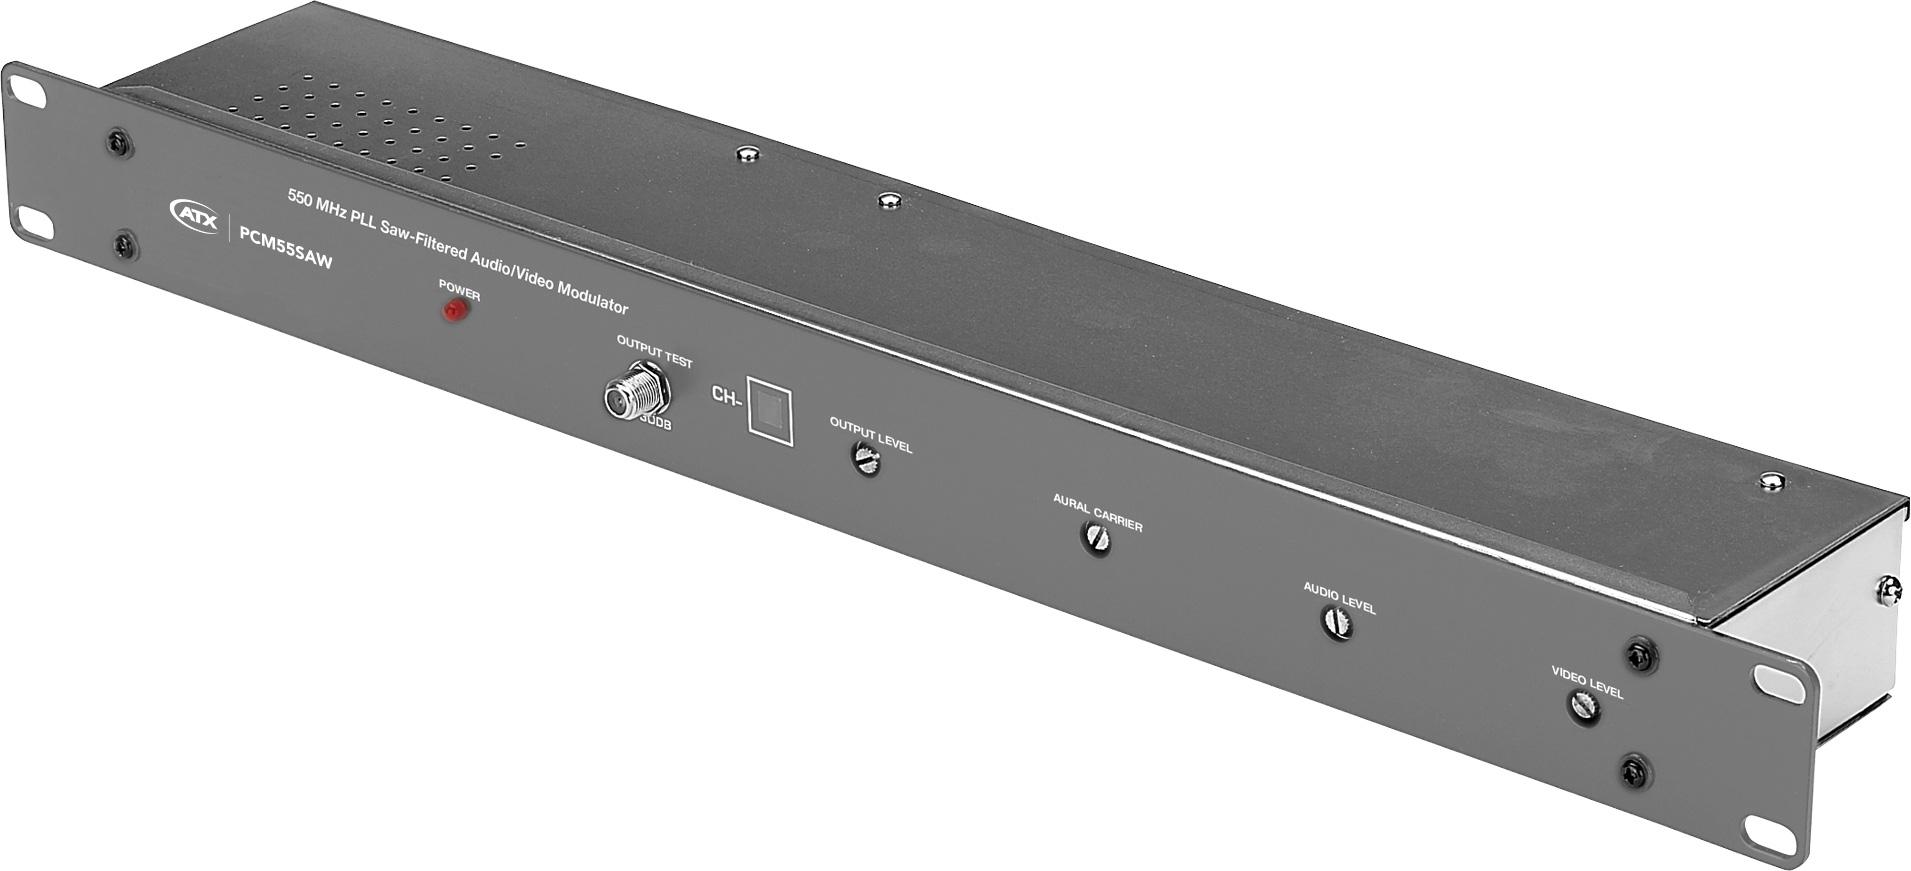 1 Channel Crystal A/V Modulator - Channel 6 PM-PCM55SAW-6